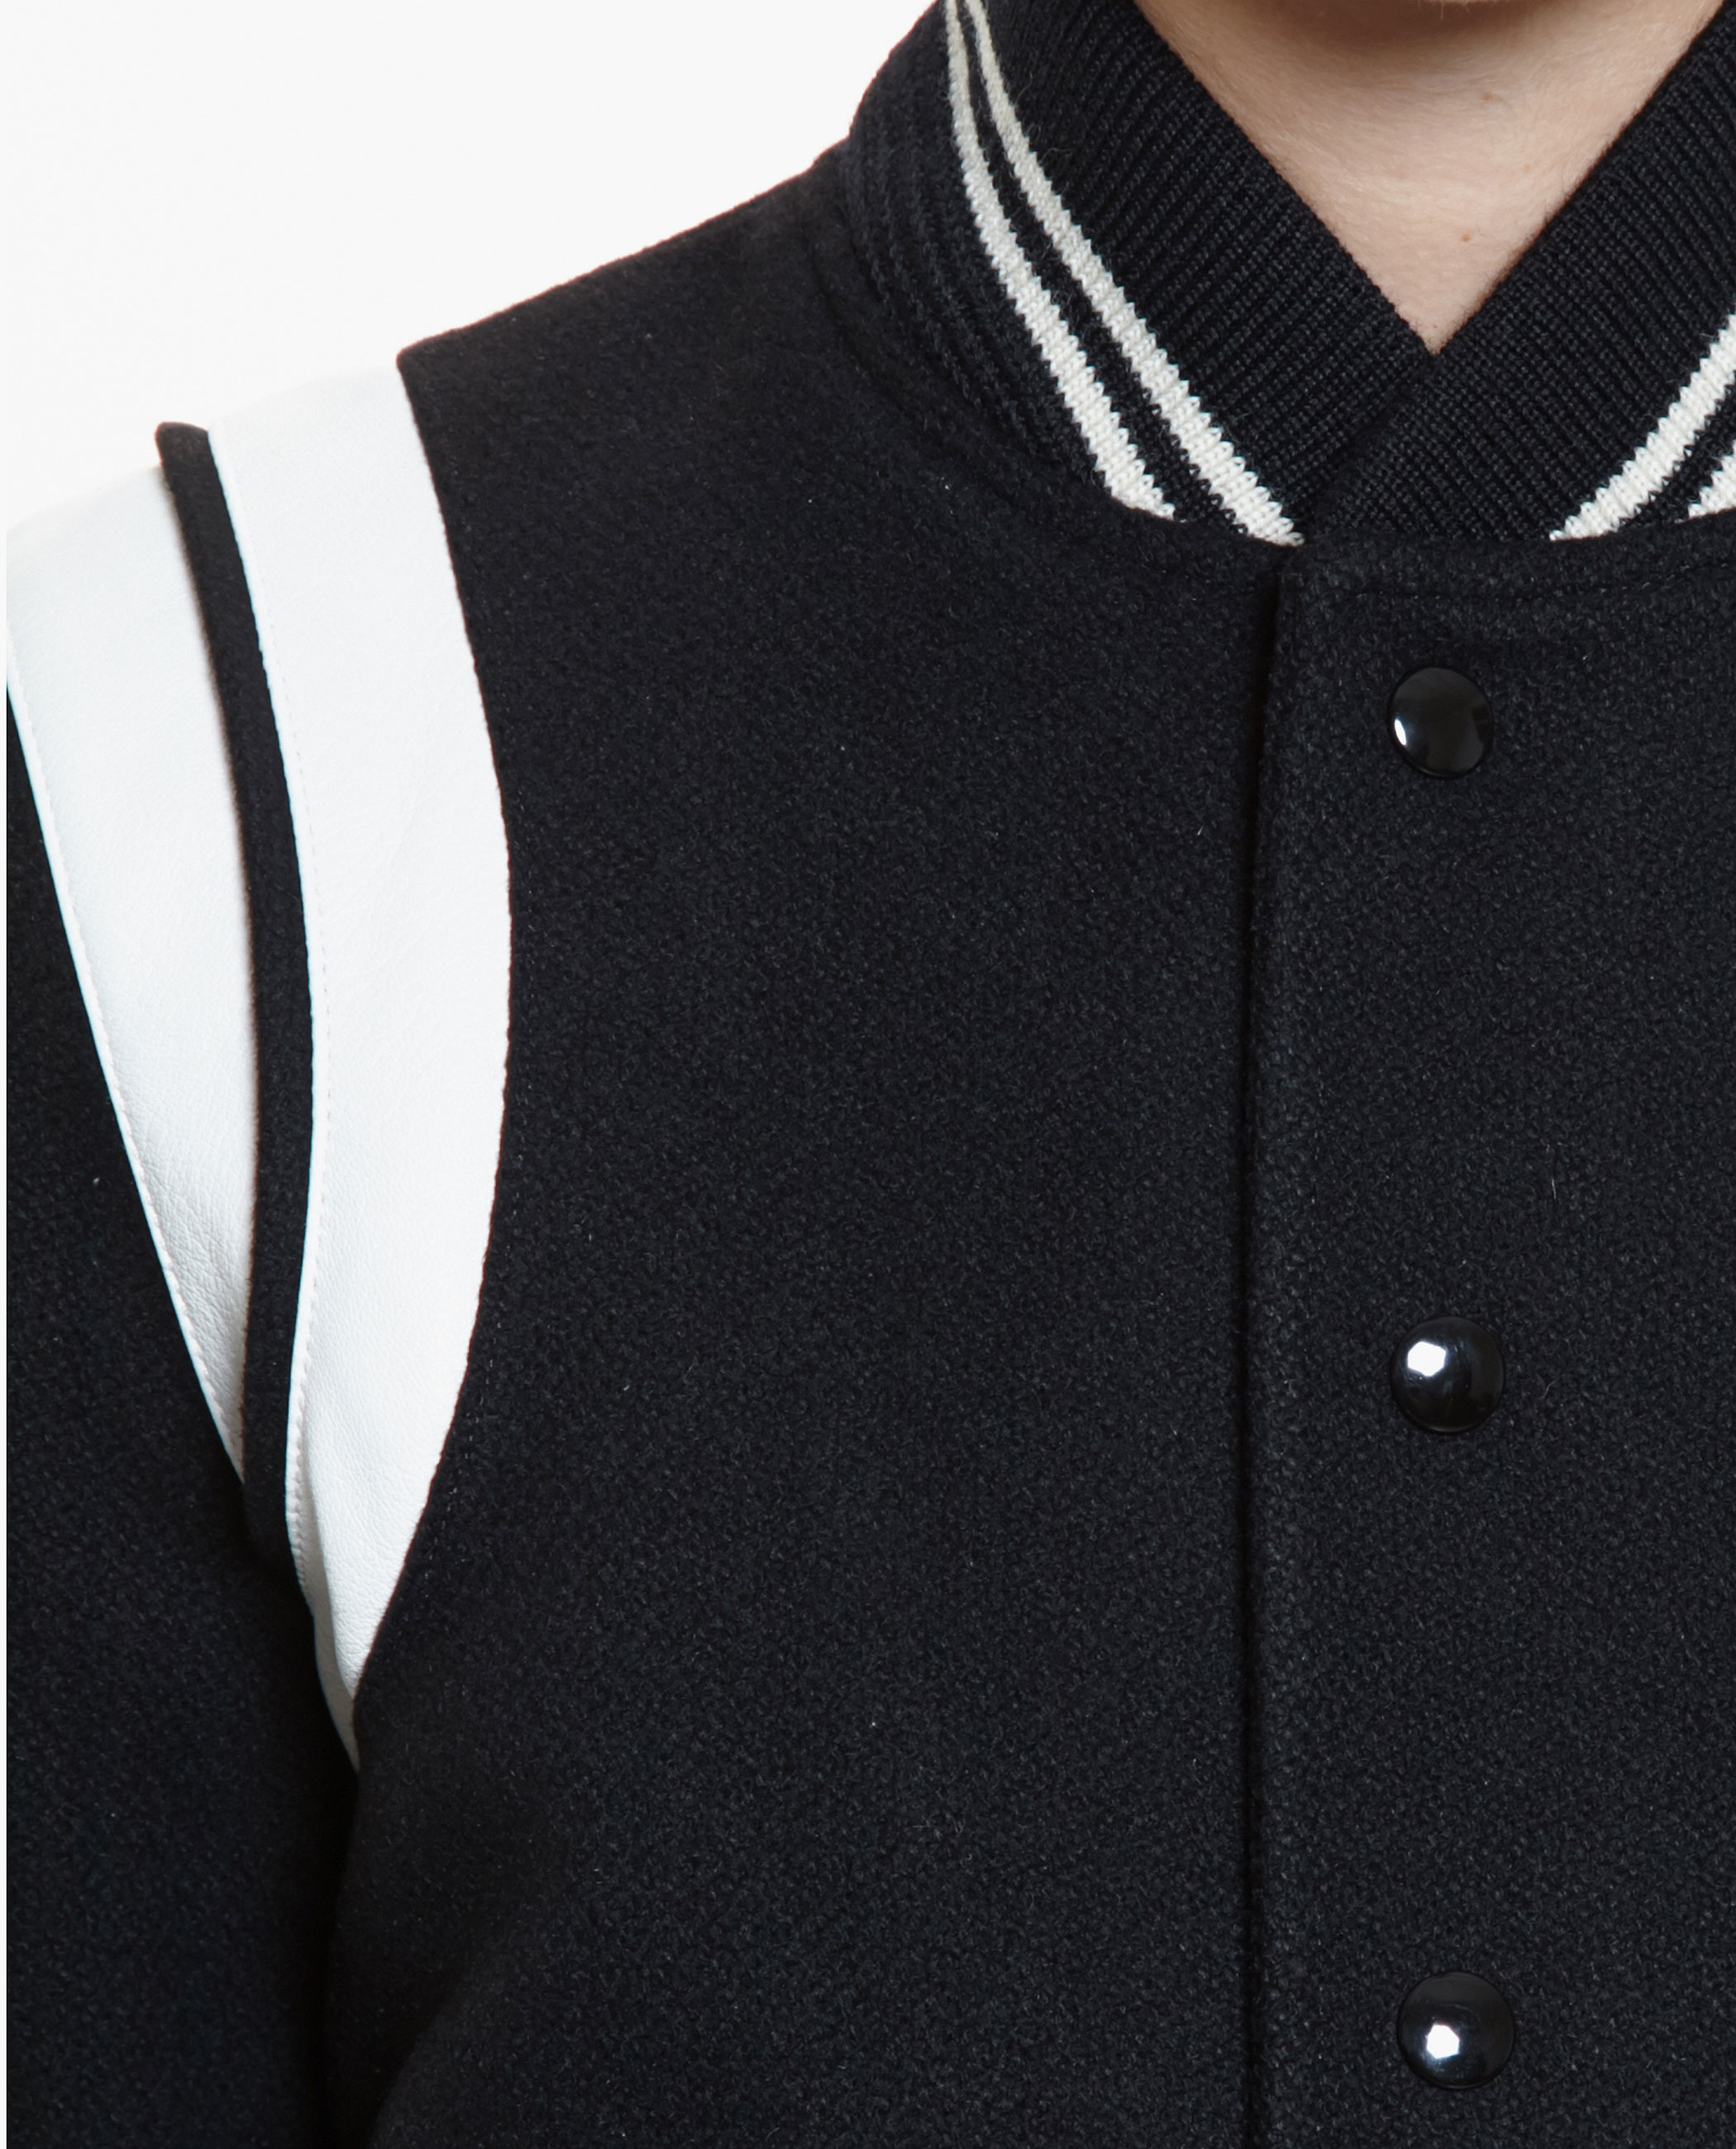 d94b4b377 Saint Laurent Teddy Leather-Trimmed Wool Varsity Jacket in Black - Lyst